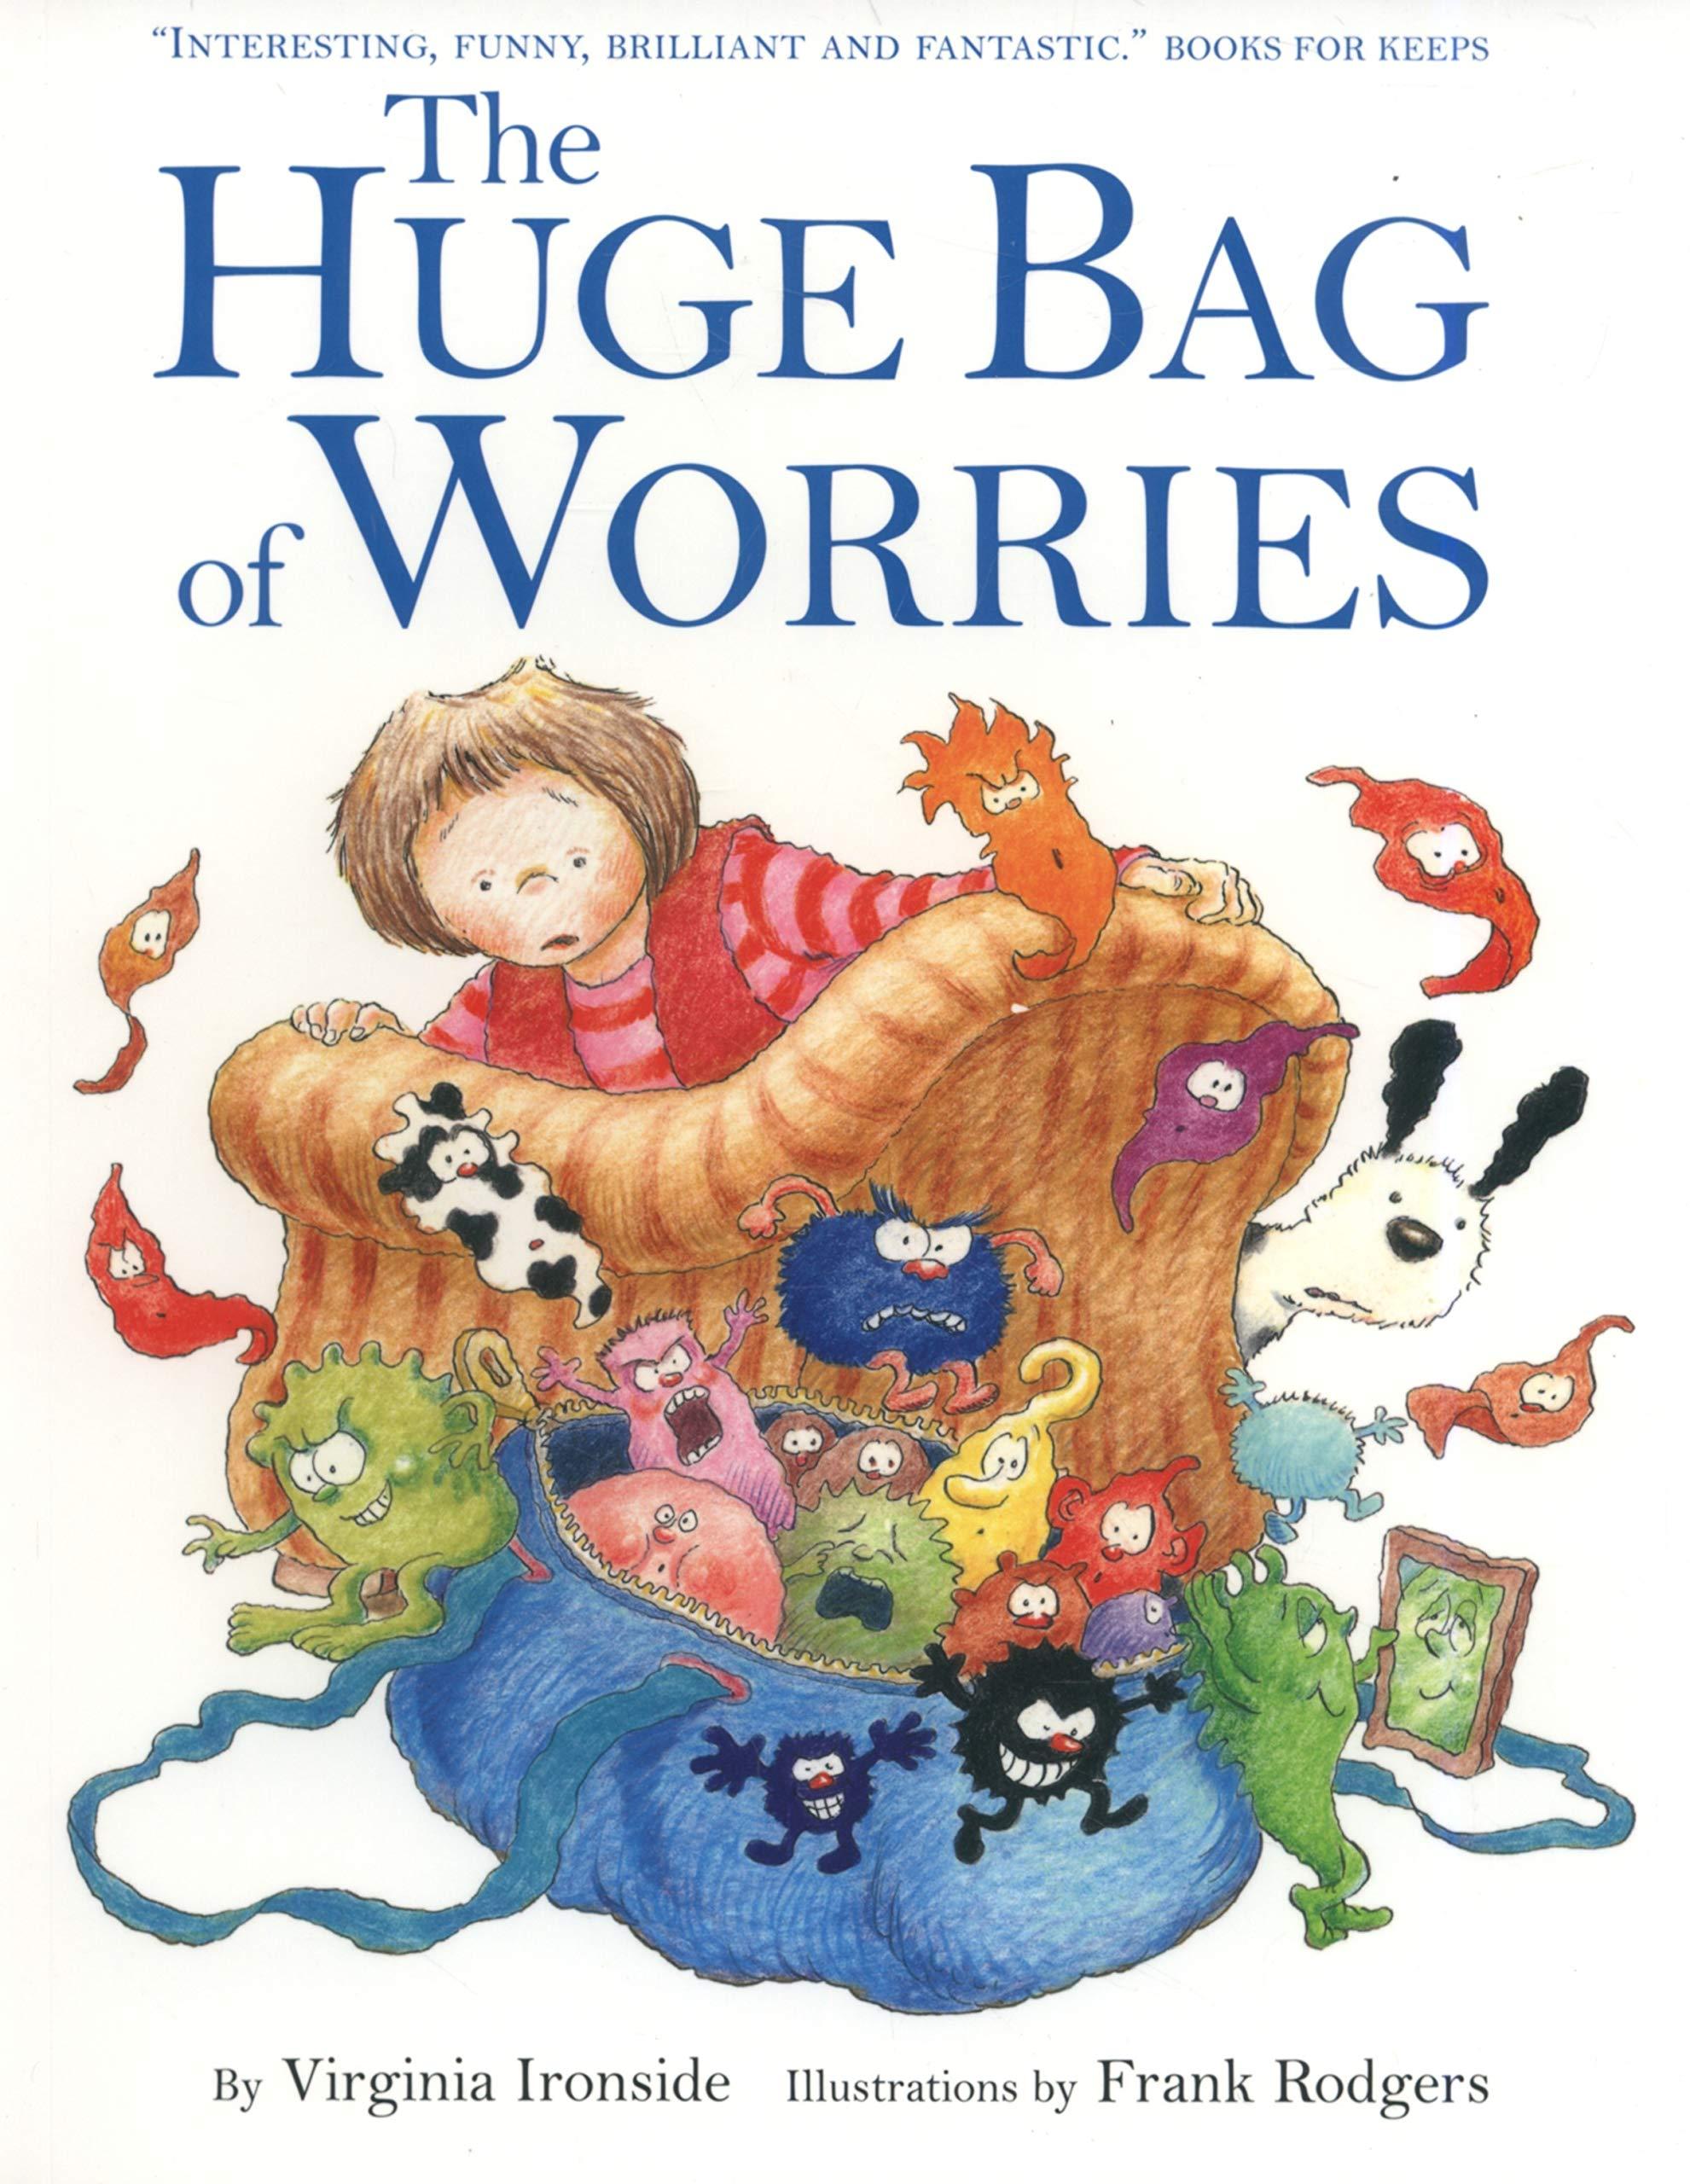 The Huge Bag of Worries: Amazon.co.uk: Ironside, Virginia, Rodgers, Frank:  9780340903179: Books